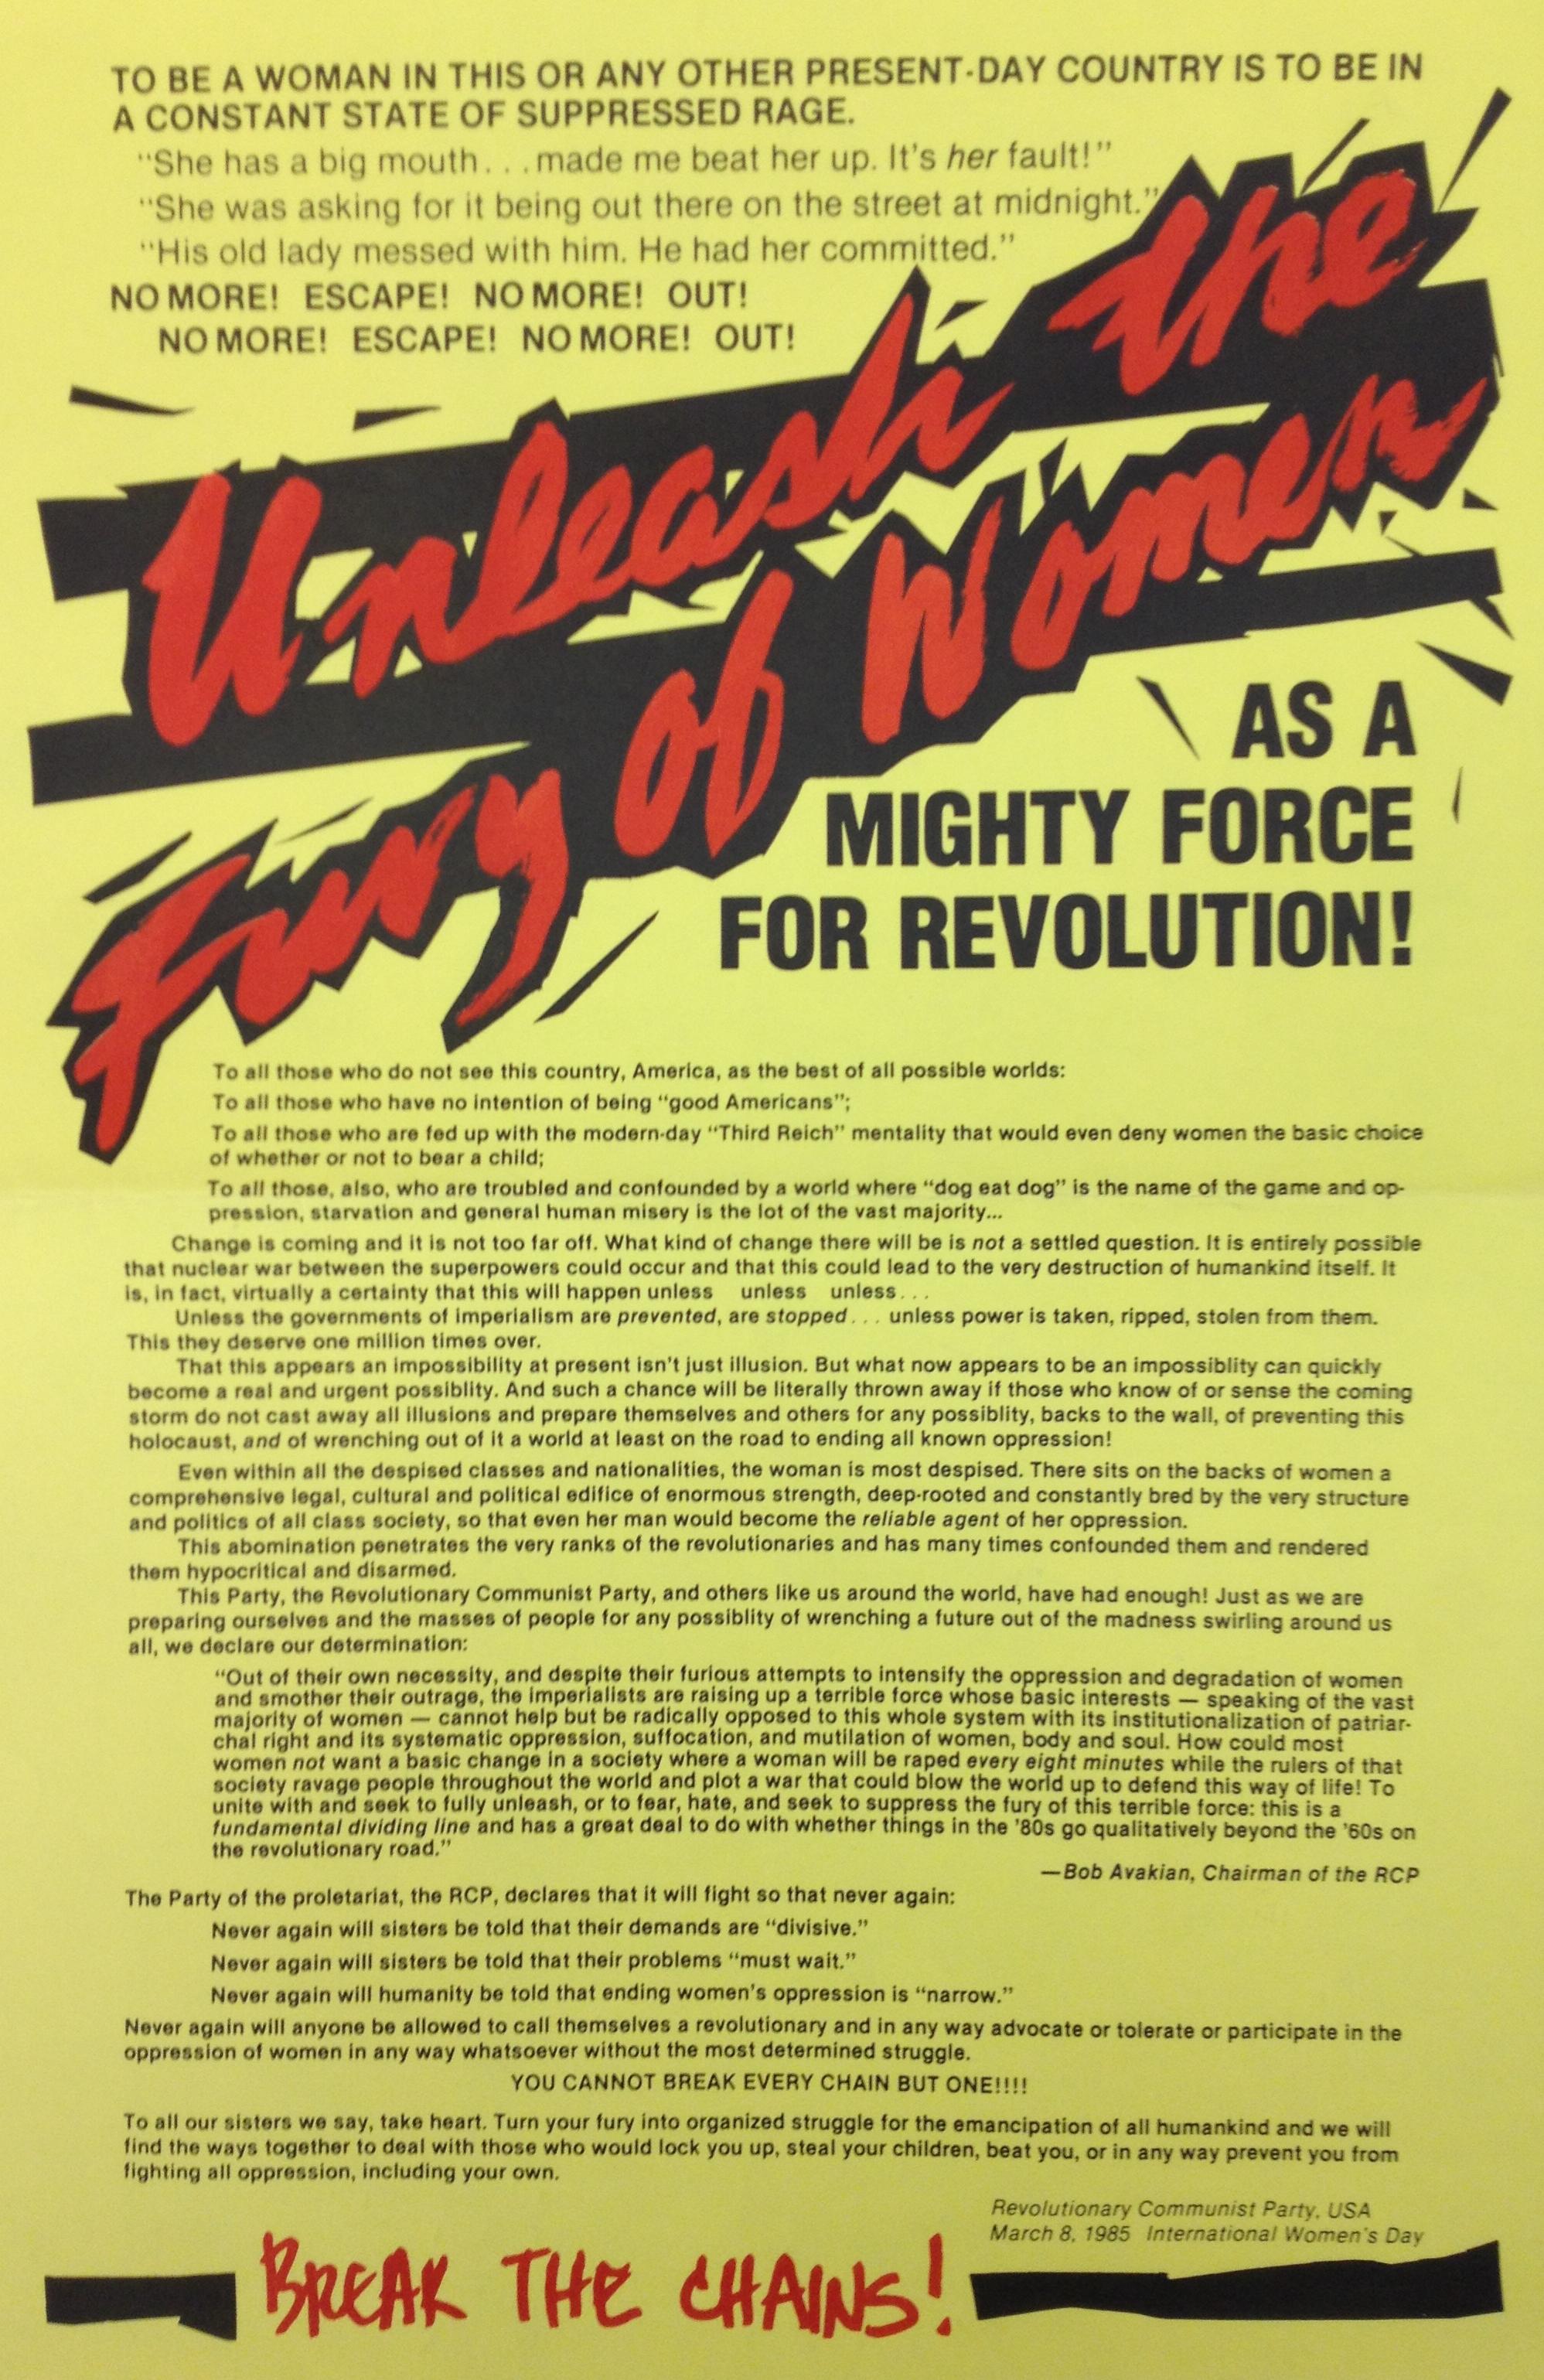 Revolutionary Communist Party, USA